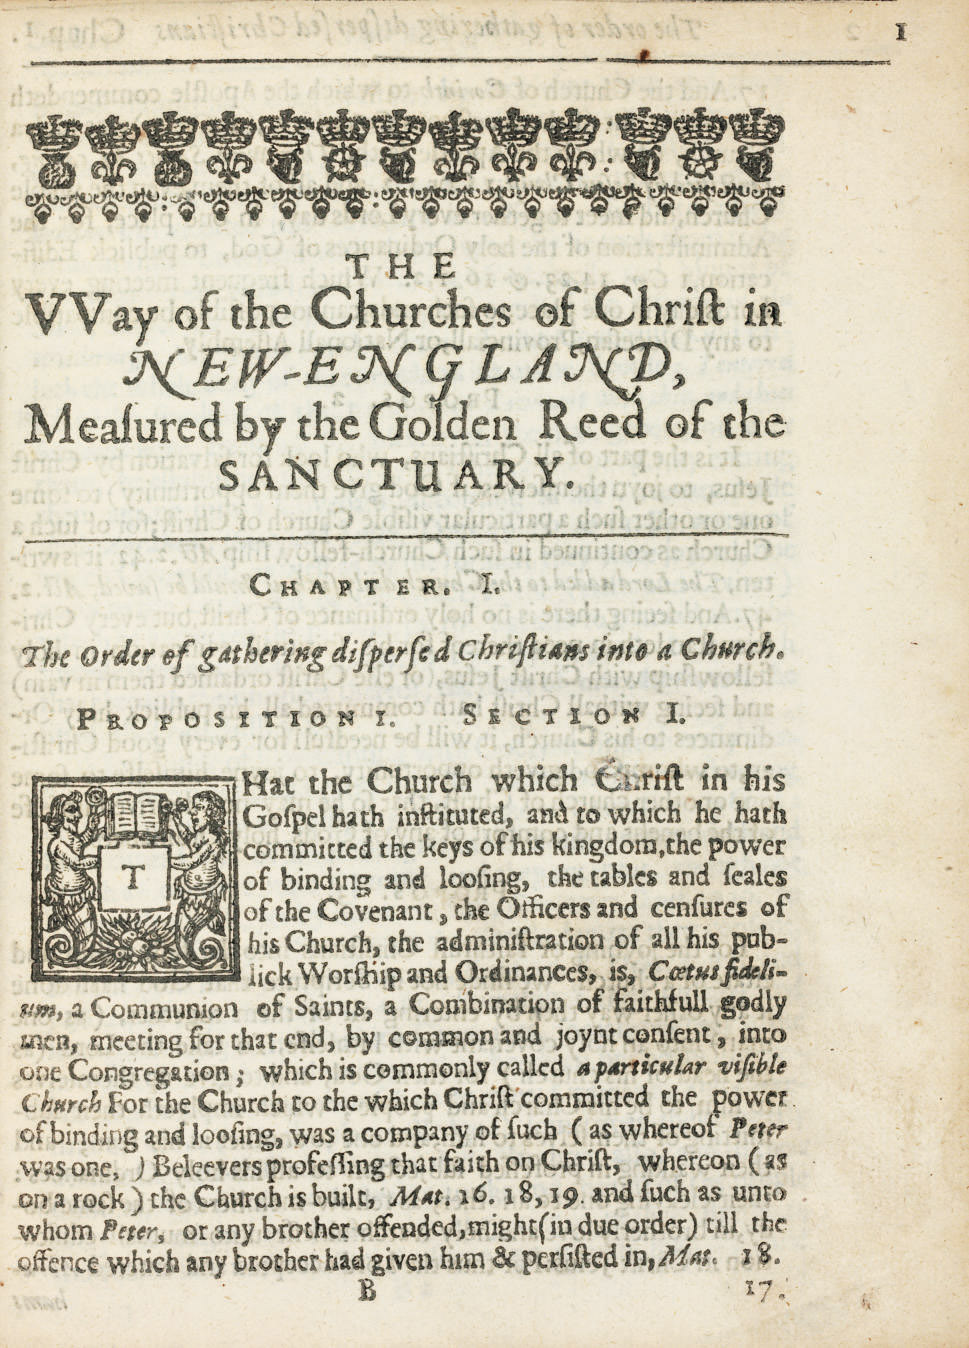 COTTON, John (1594-1652). The